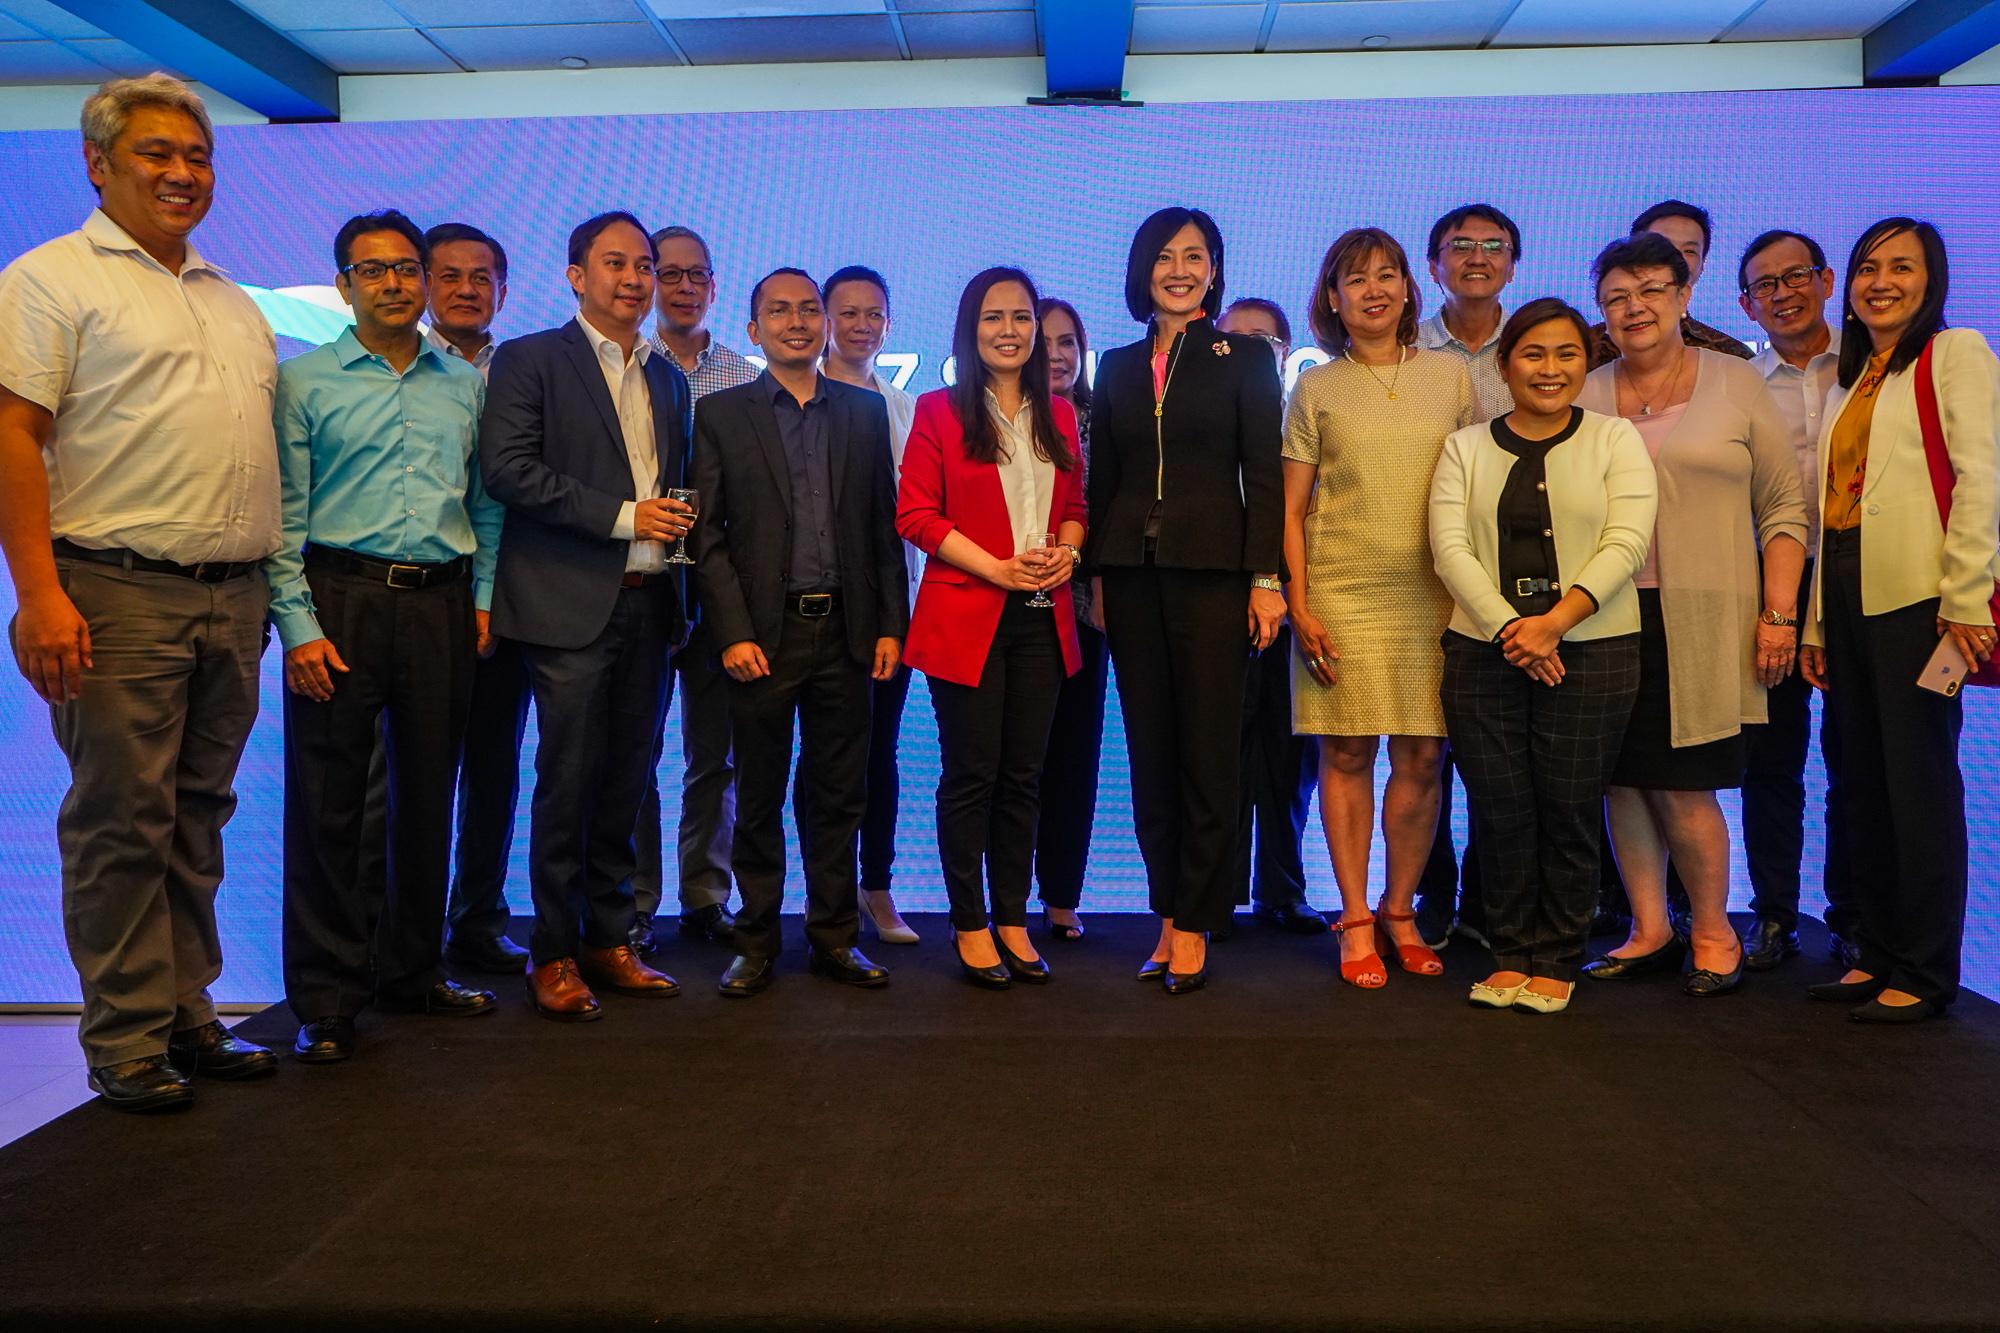 Aboitiz Foundation COO Maribeth Marasigan with AIM officials at the unveiling of the Aboitiz School of Innovation, Technology & Entrepreneurship